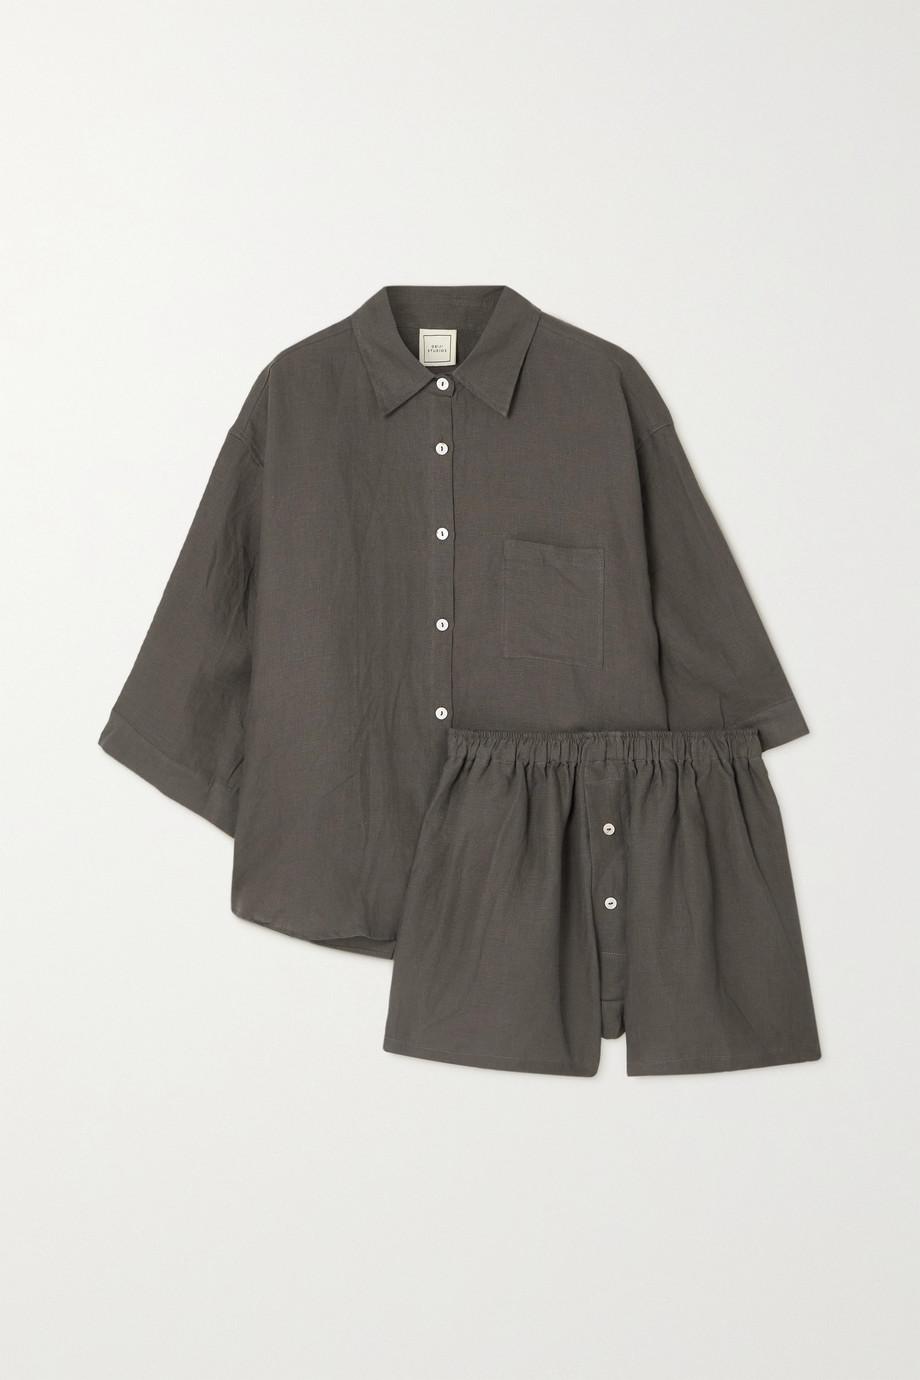 Deiji Studios 03 washed-linen shirt and shorts set